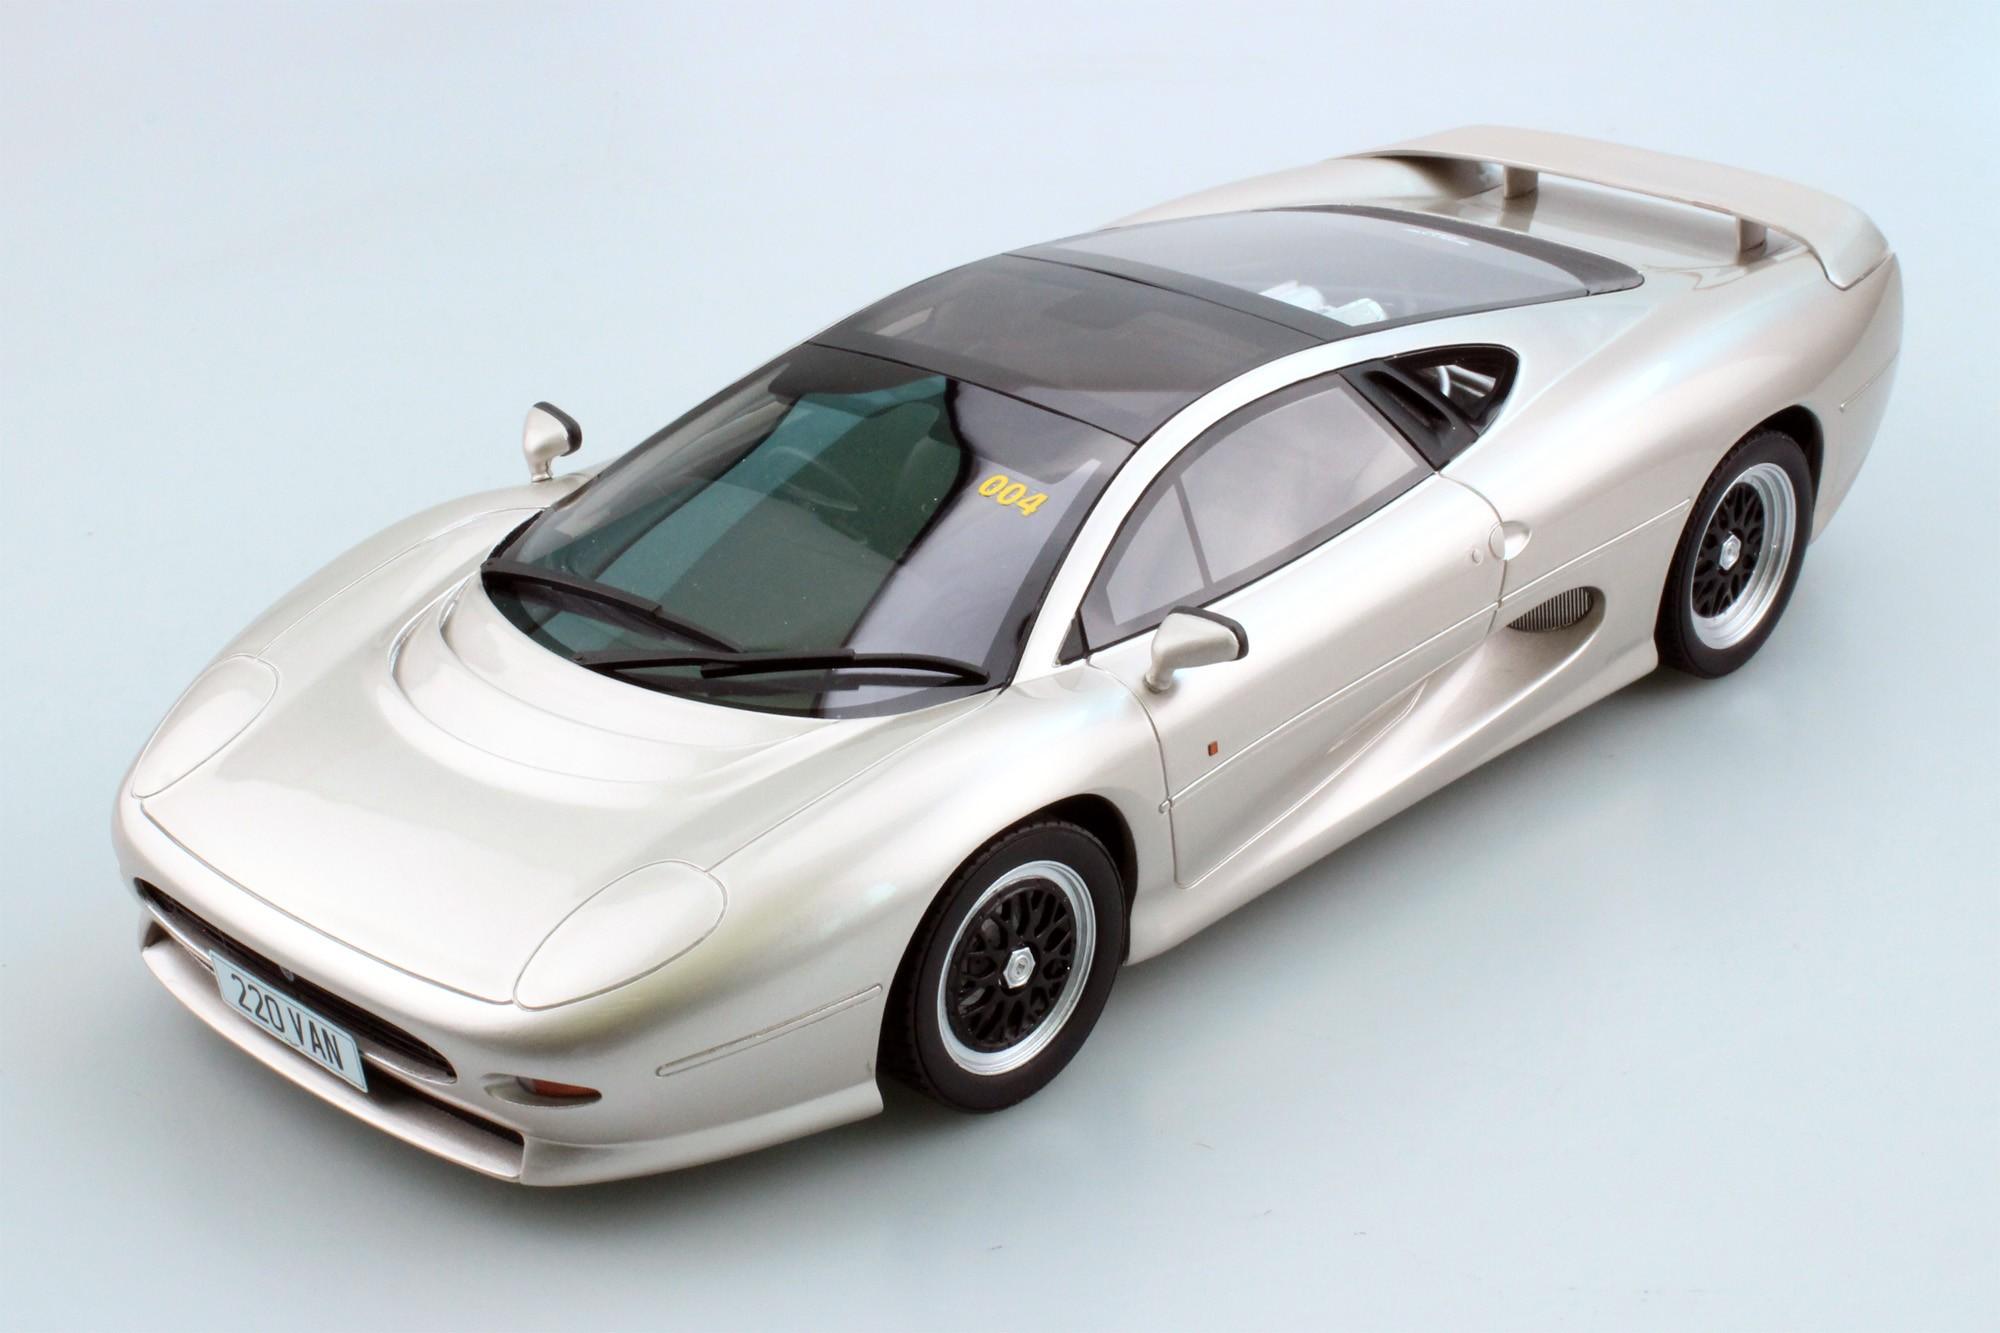 Top Marques Collectibles Jaguar Xj220 Don Law Edition Pre Order